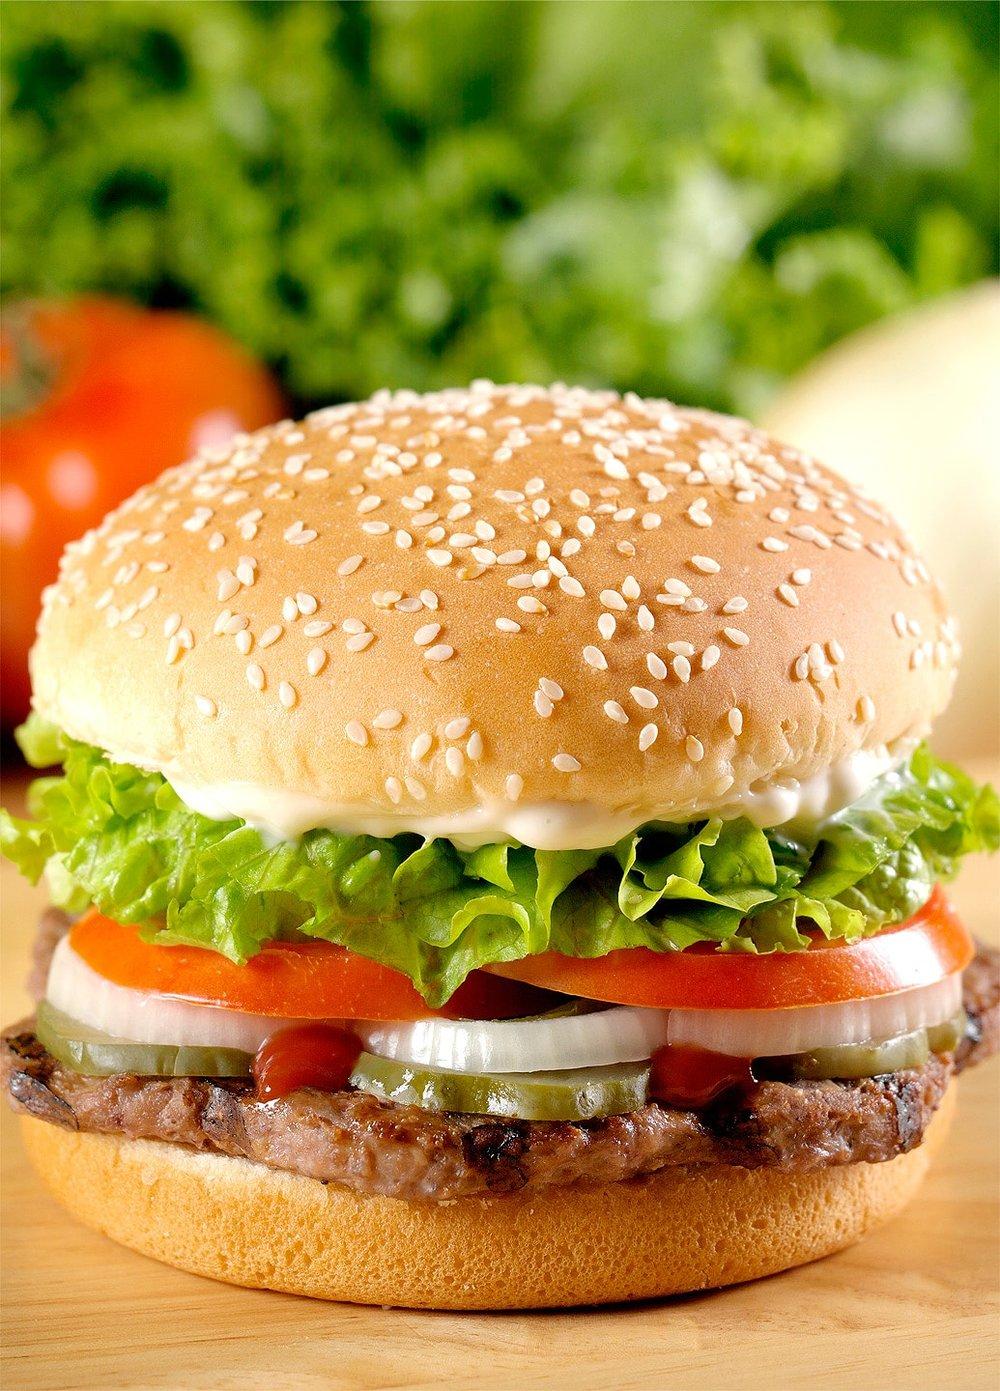 hamburgerfood-photography-miami-marcel-boldu.jpg